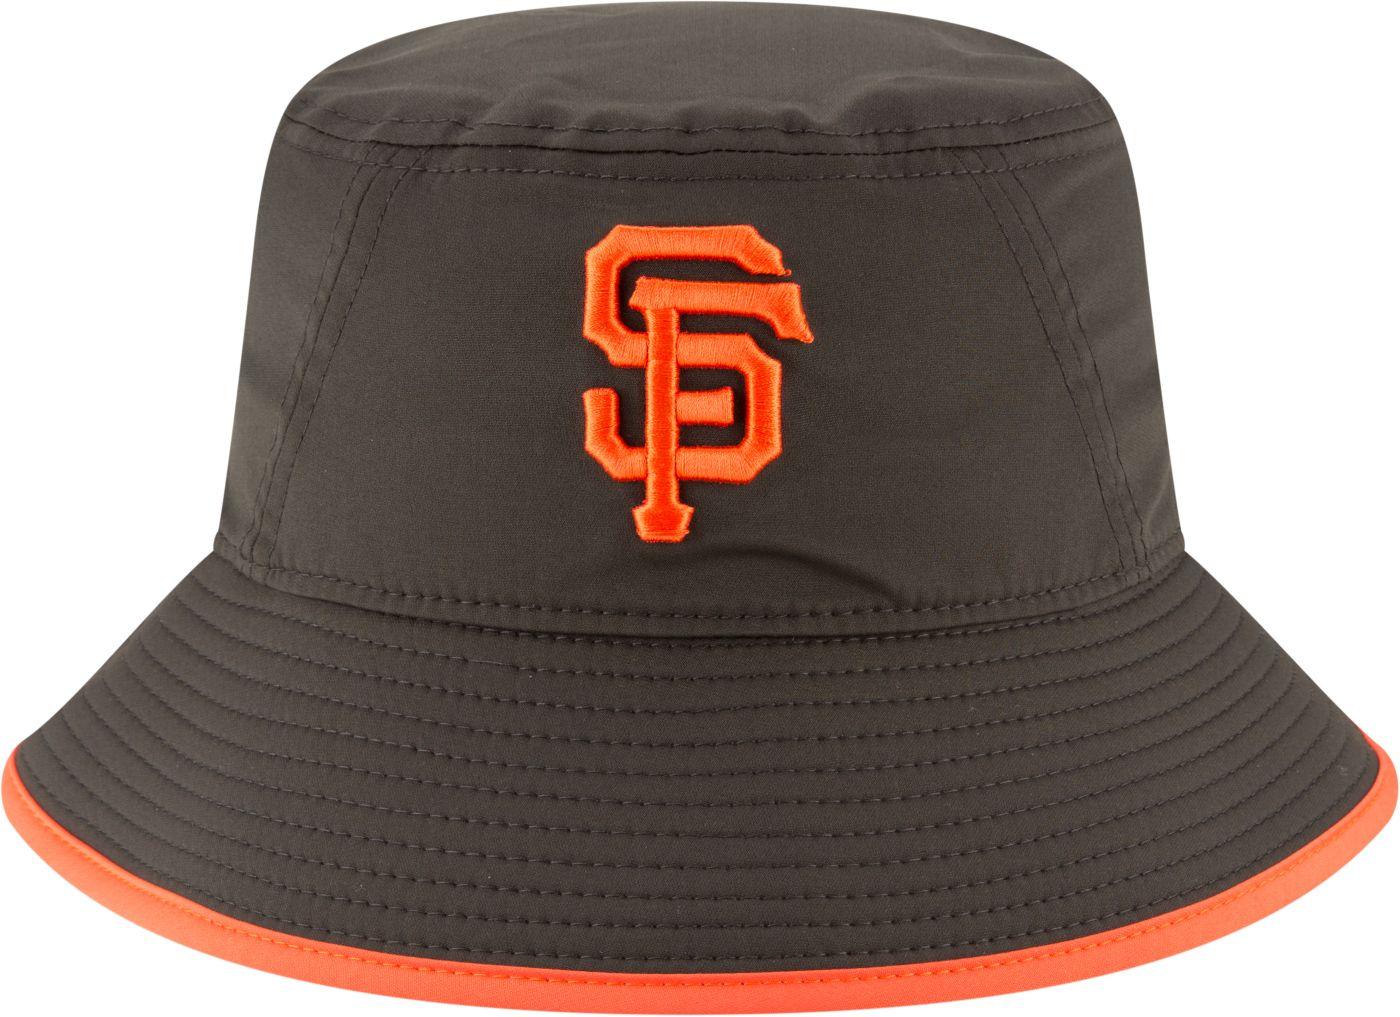 New Era Men's San Francisco Giants Clubhouse Bucket Hat